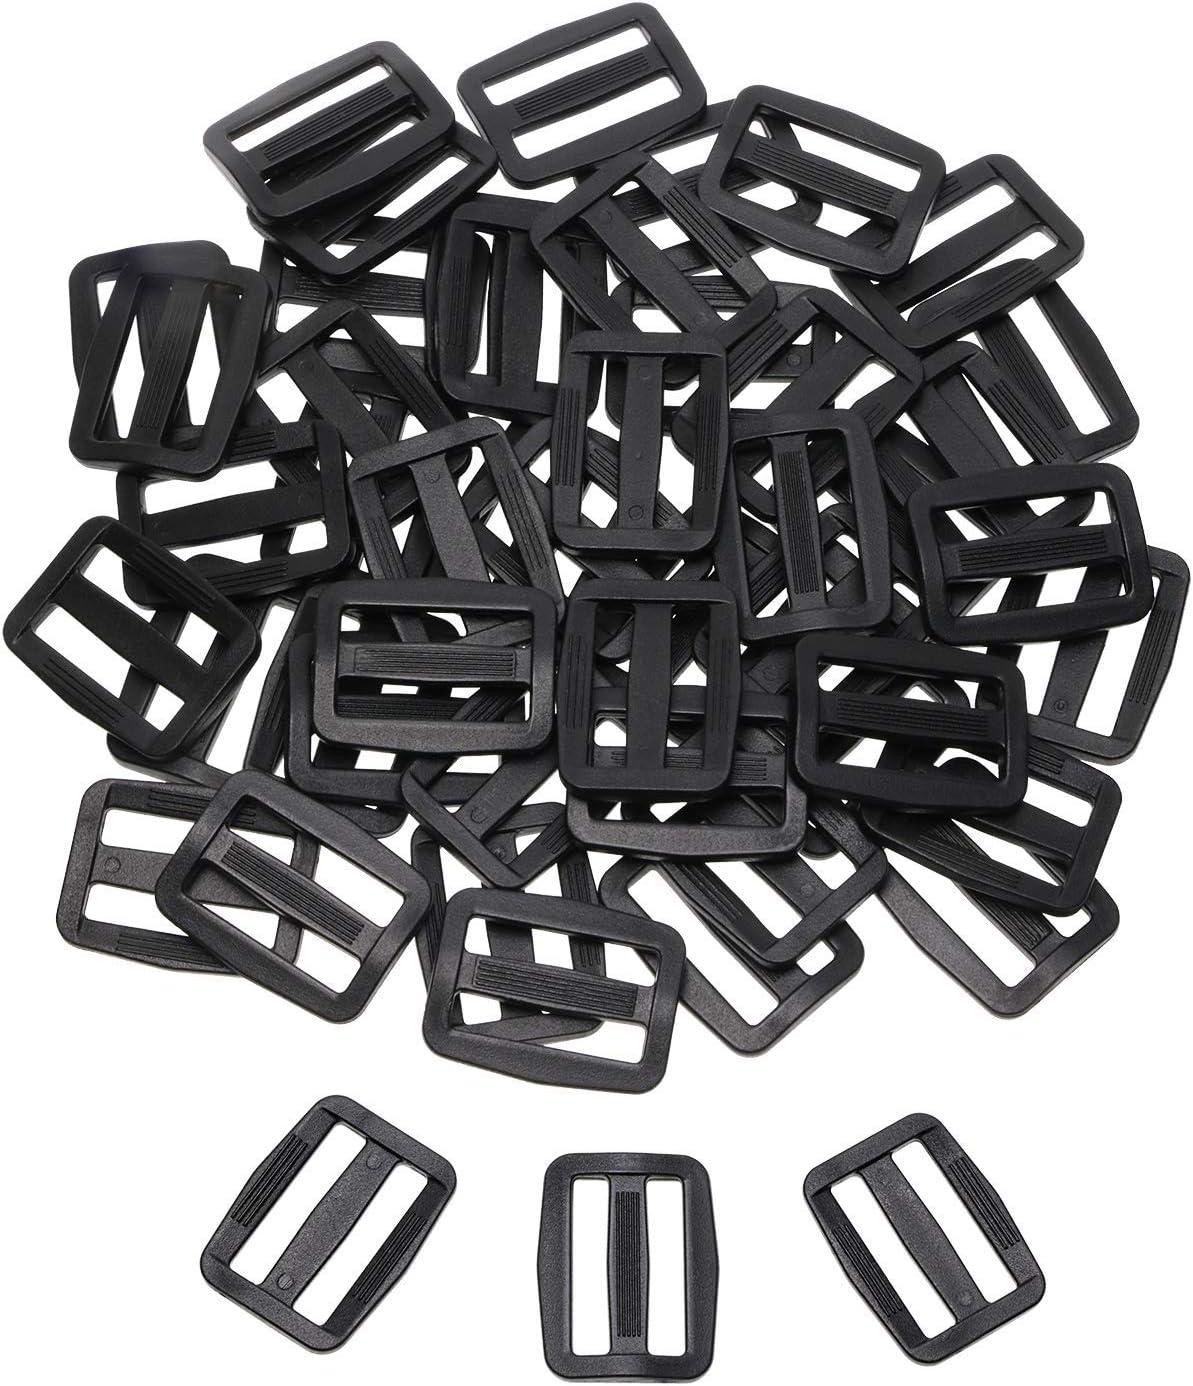 Shapenty 50PCS Black Plastic Tri-Glide